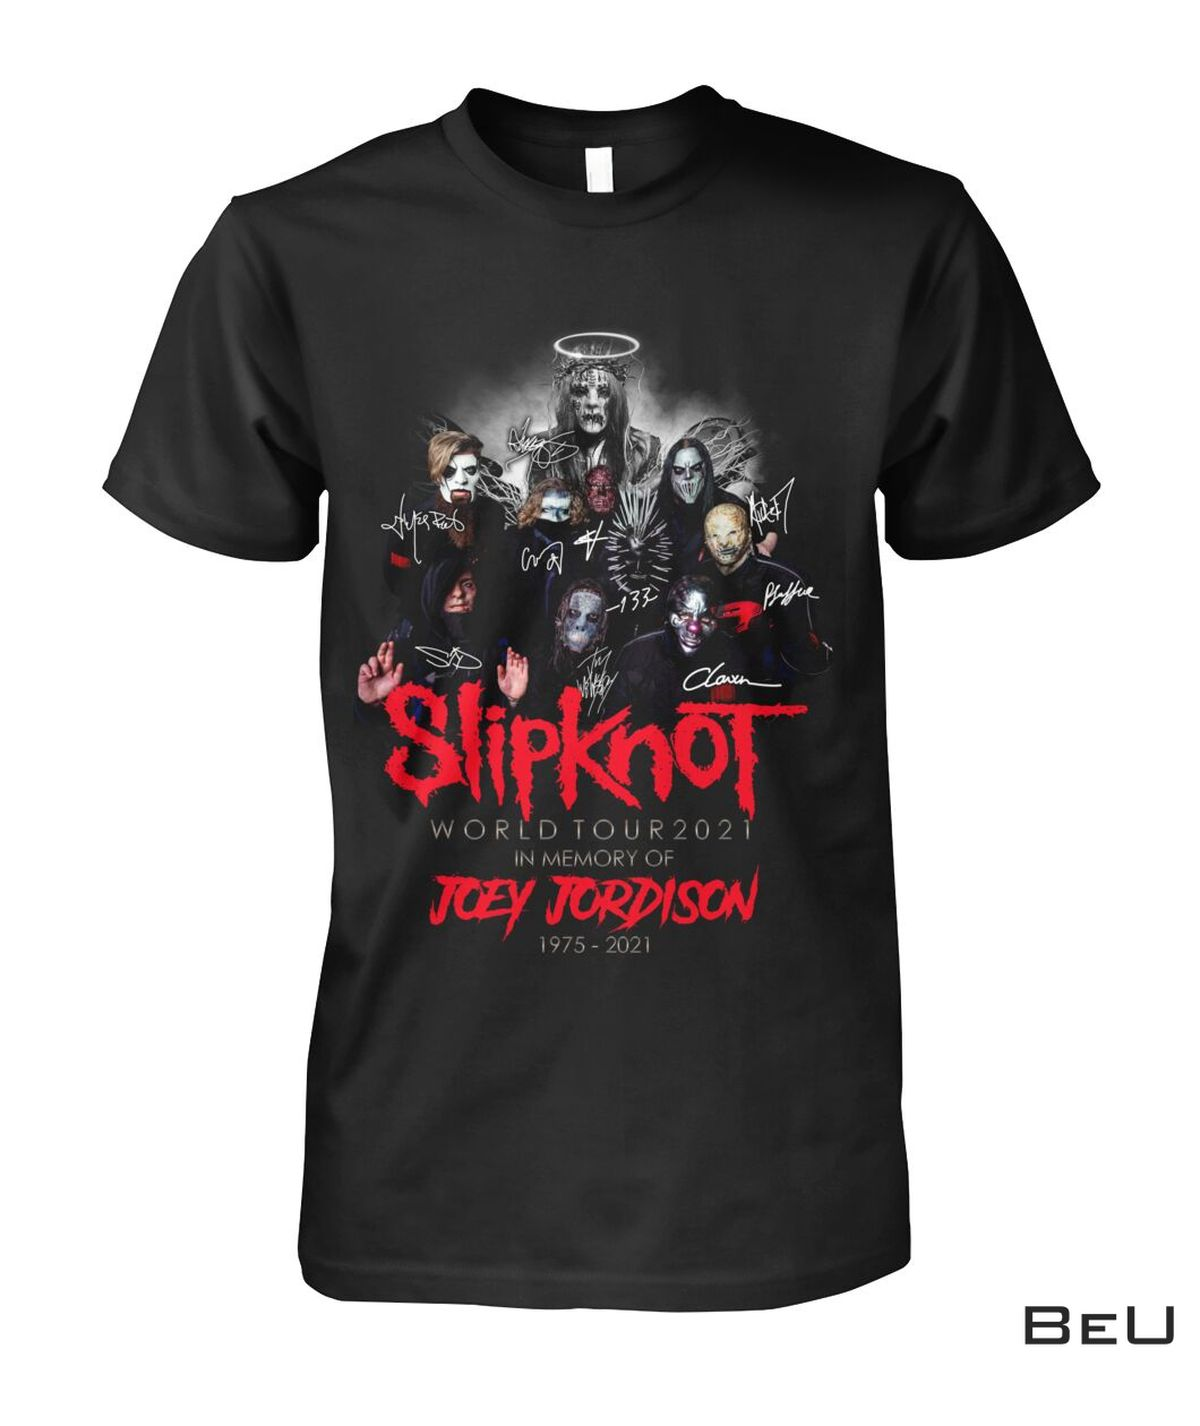 Slipknot Joey Jordison World Tour 2021 Shirt